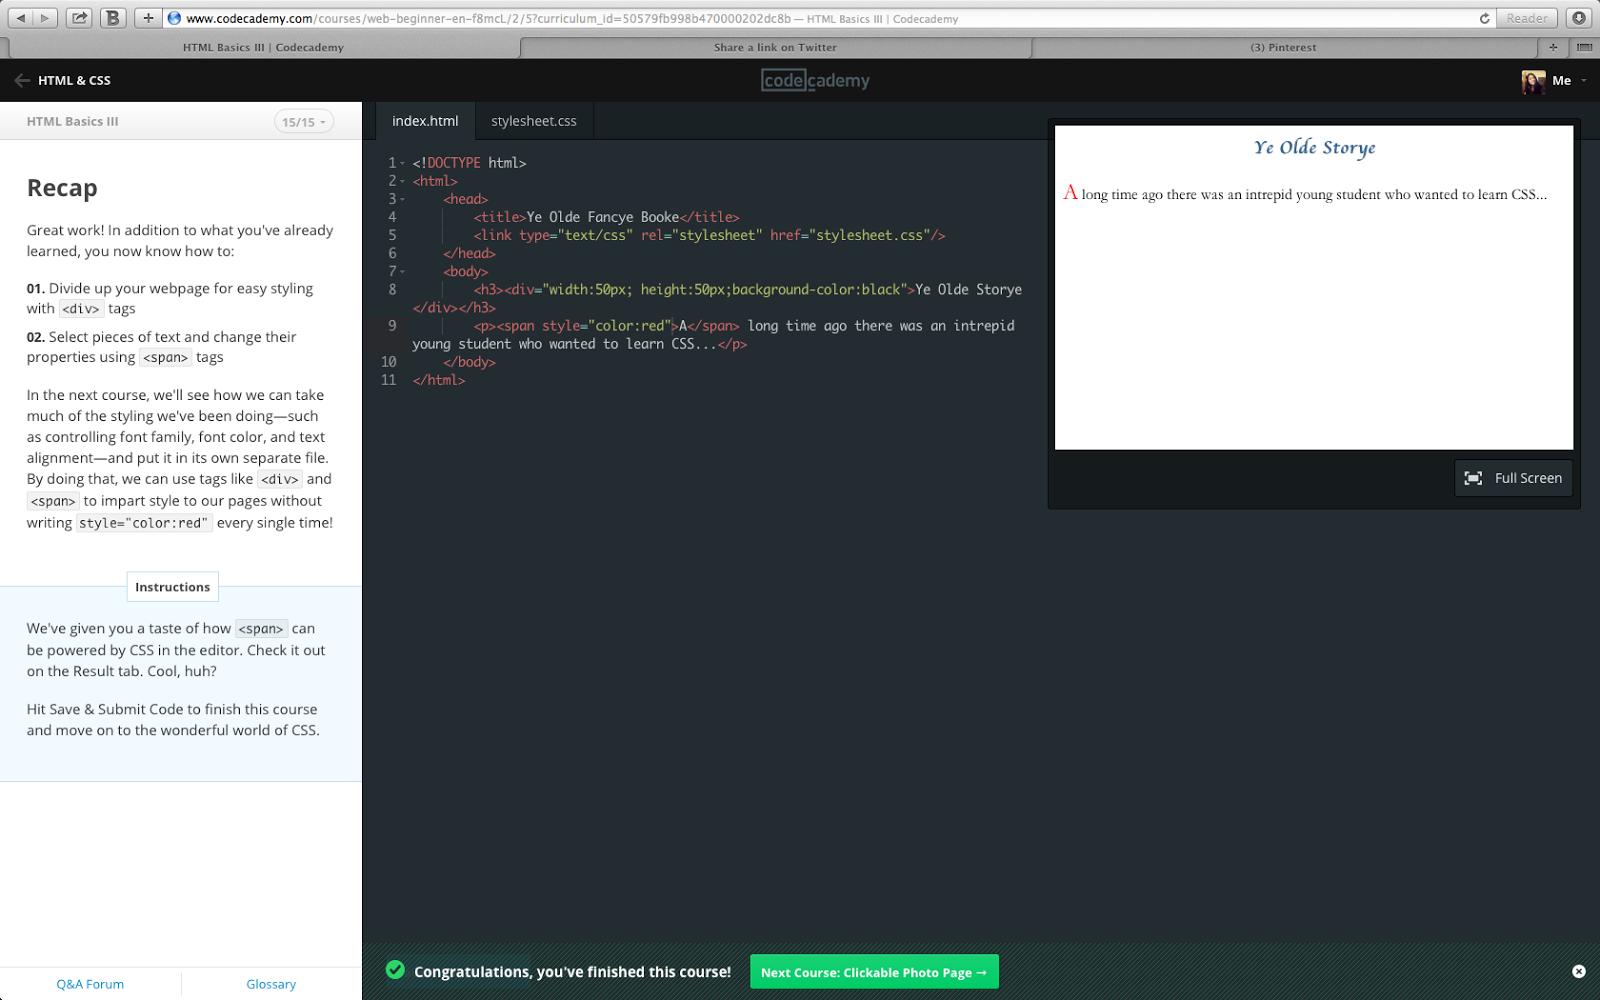 Nadia Larashari Shabrina: Codecademy: HTML Basic III